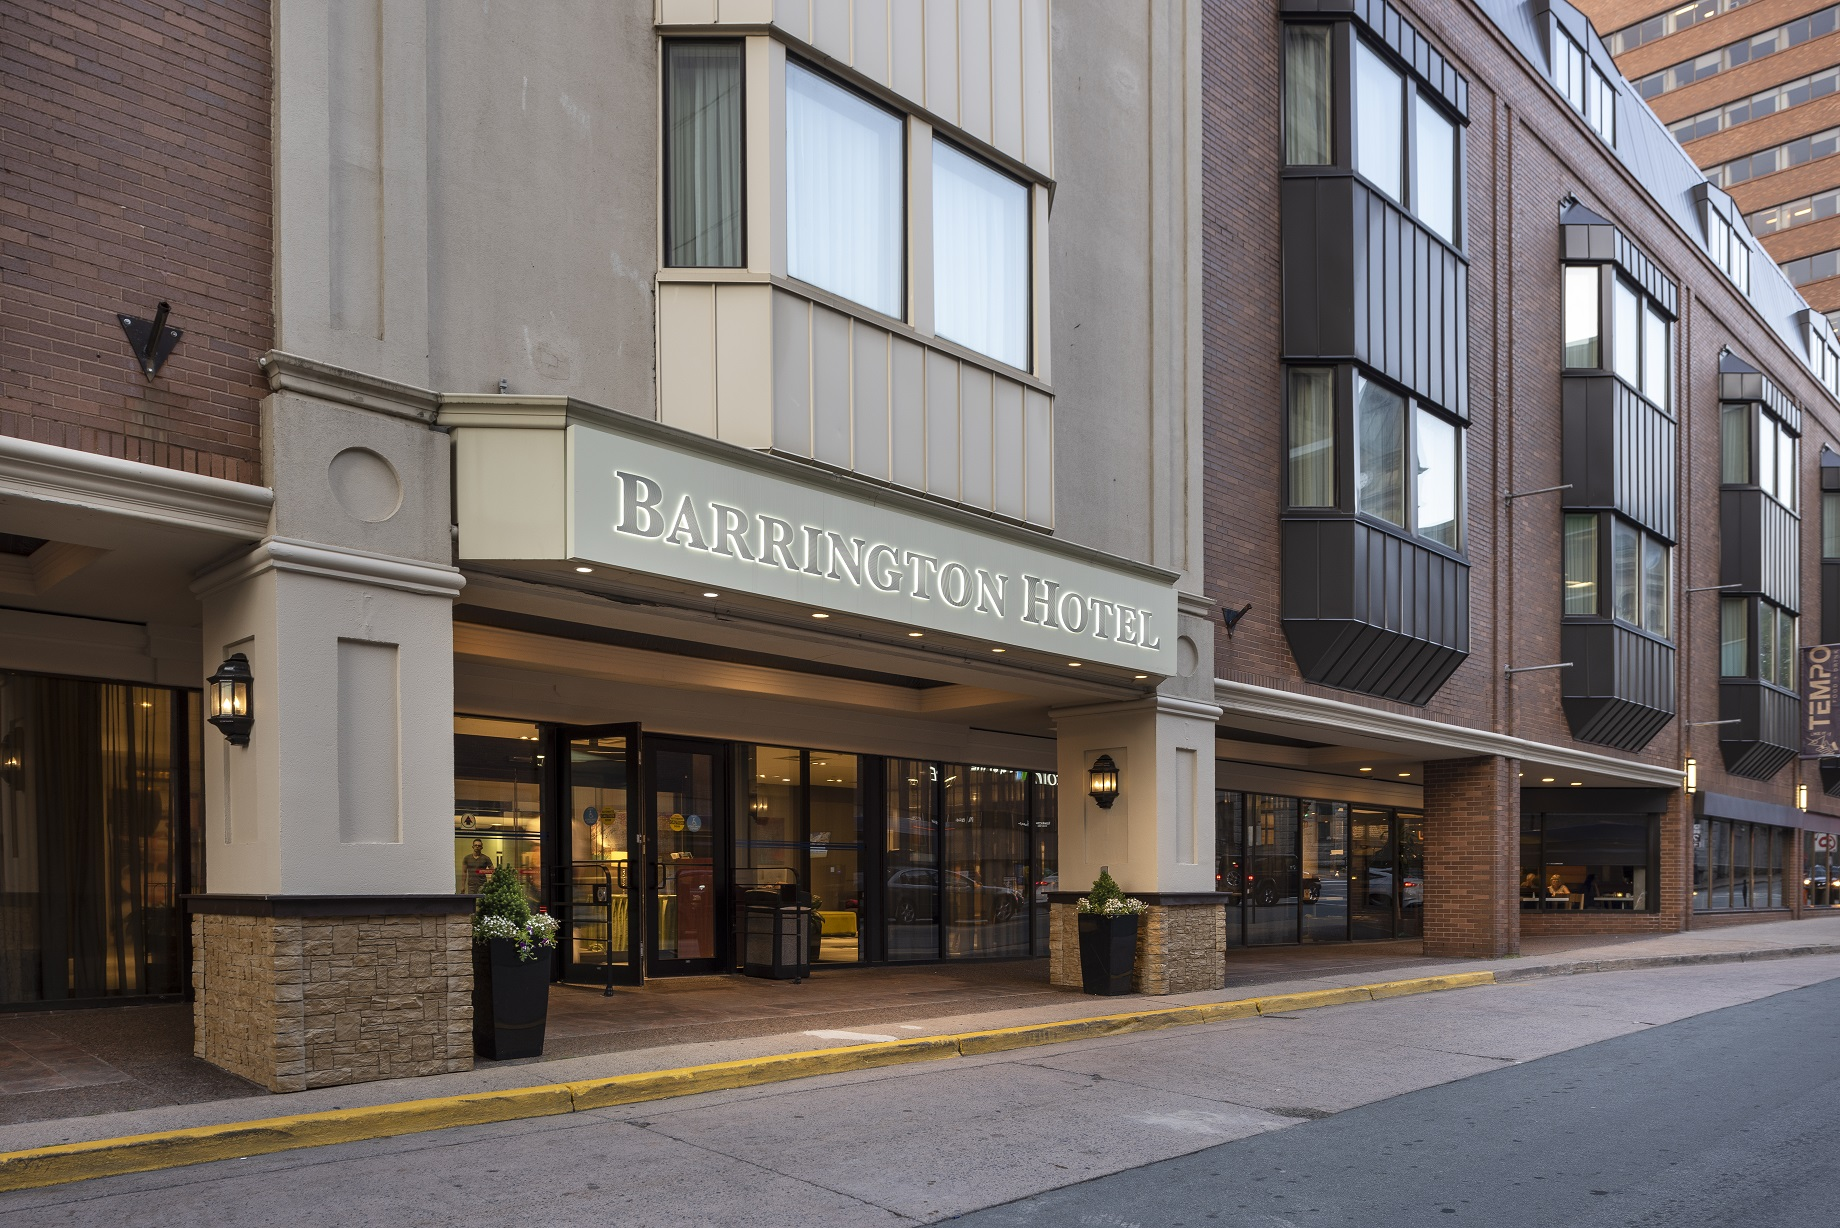 The Barrington Hotel, Halifax